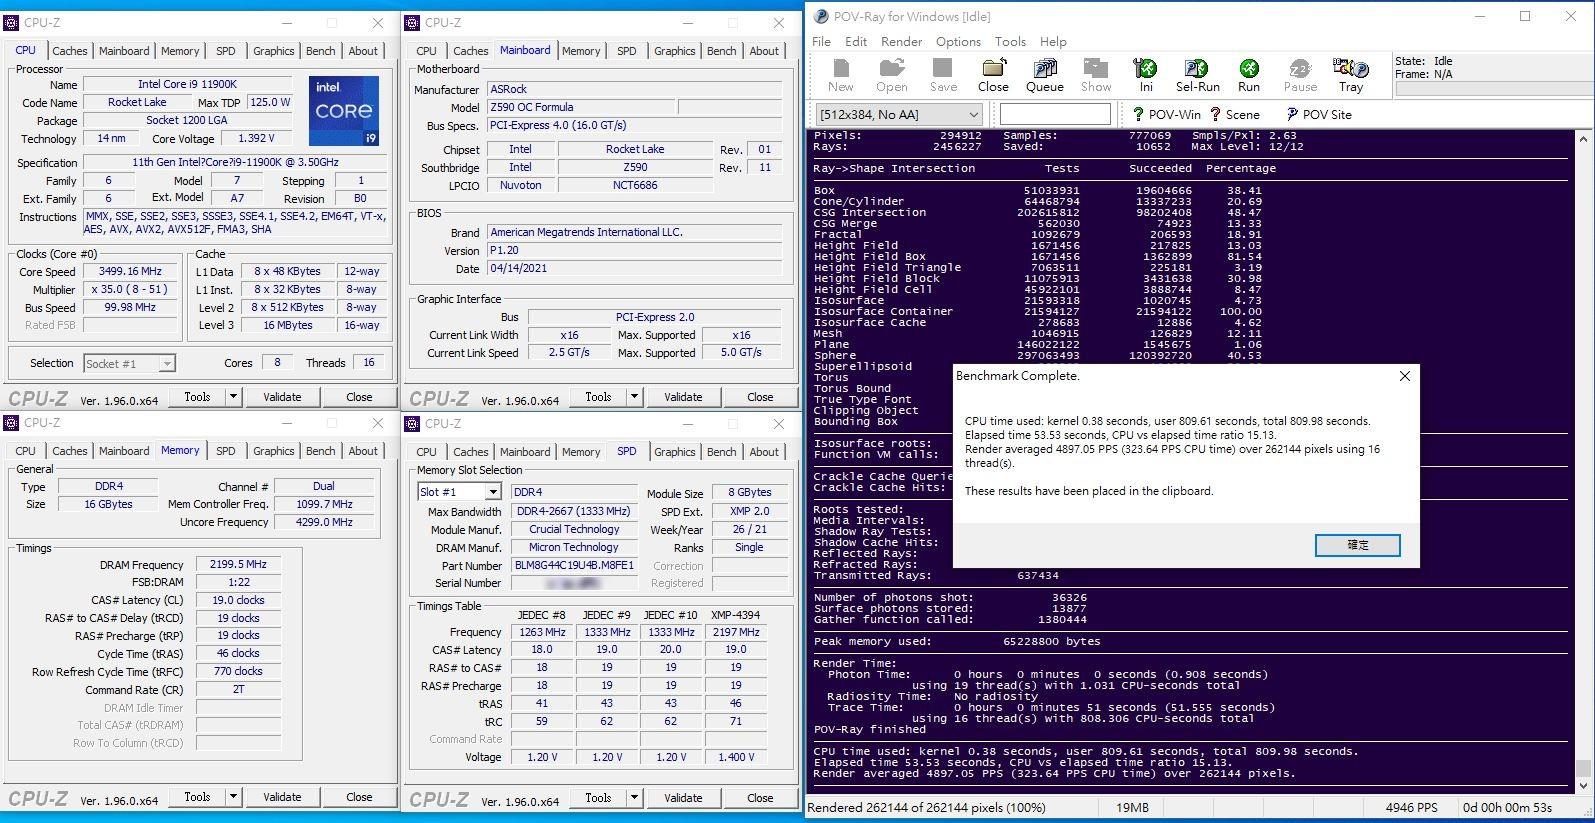 Crucial Ballistix MAX DDR4-4400電競記憶體-輕鬆獲得高頻率效能...3754